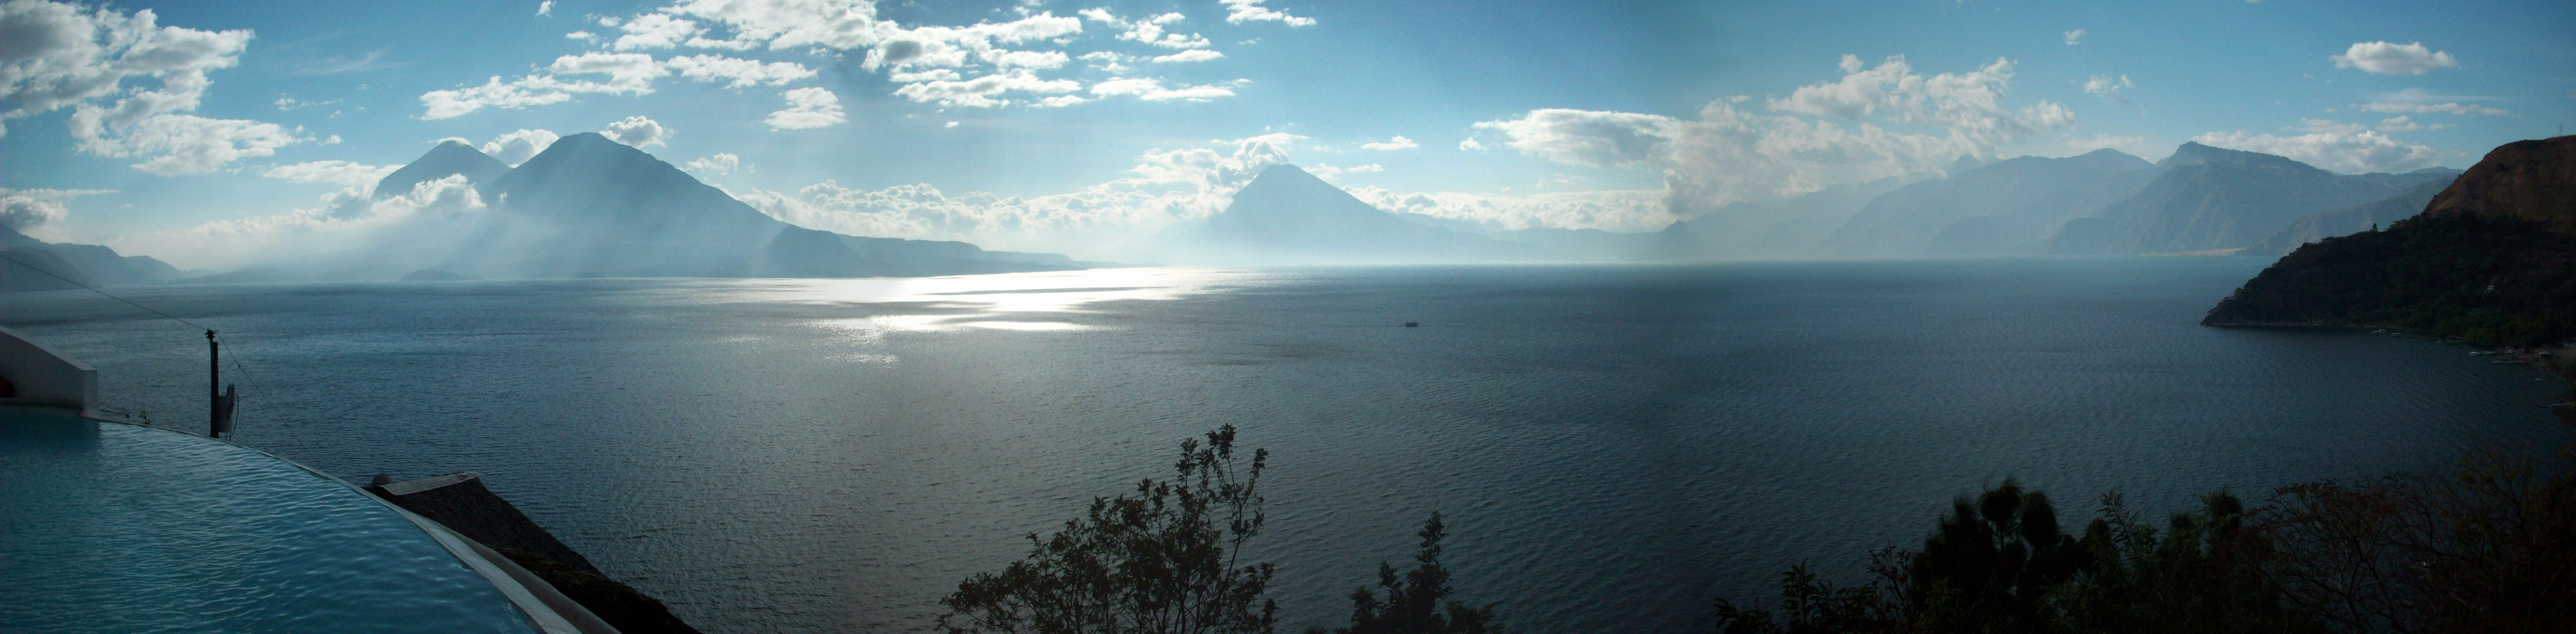 Lake Atitlan - Wikipedia Image